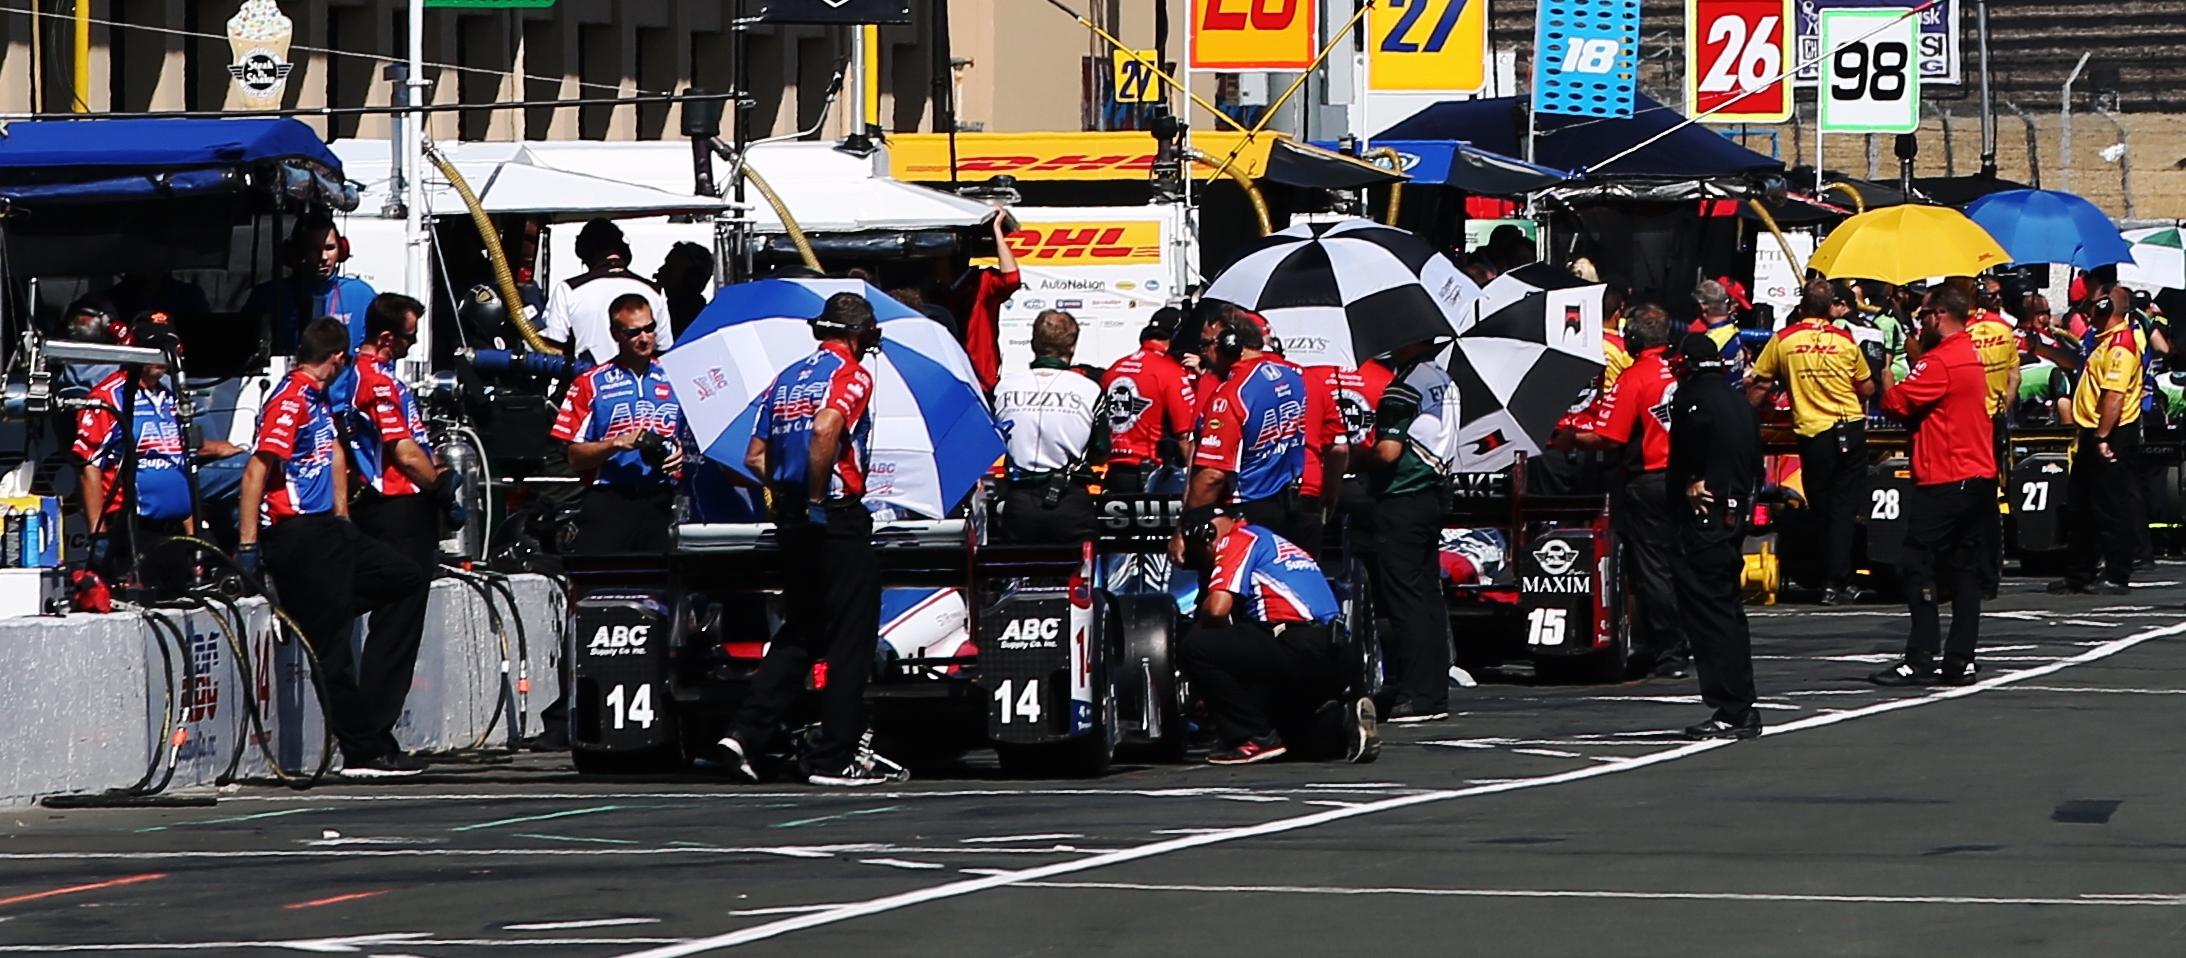 IndyCar Championship Leader Simon Pagenaud Wins Pole for